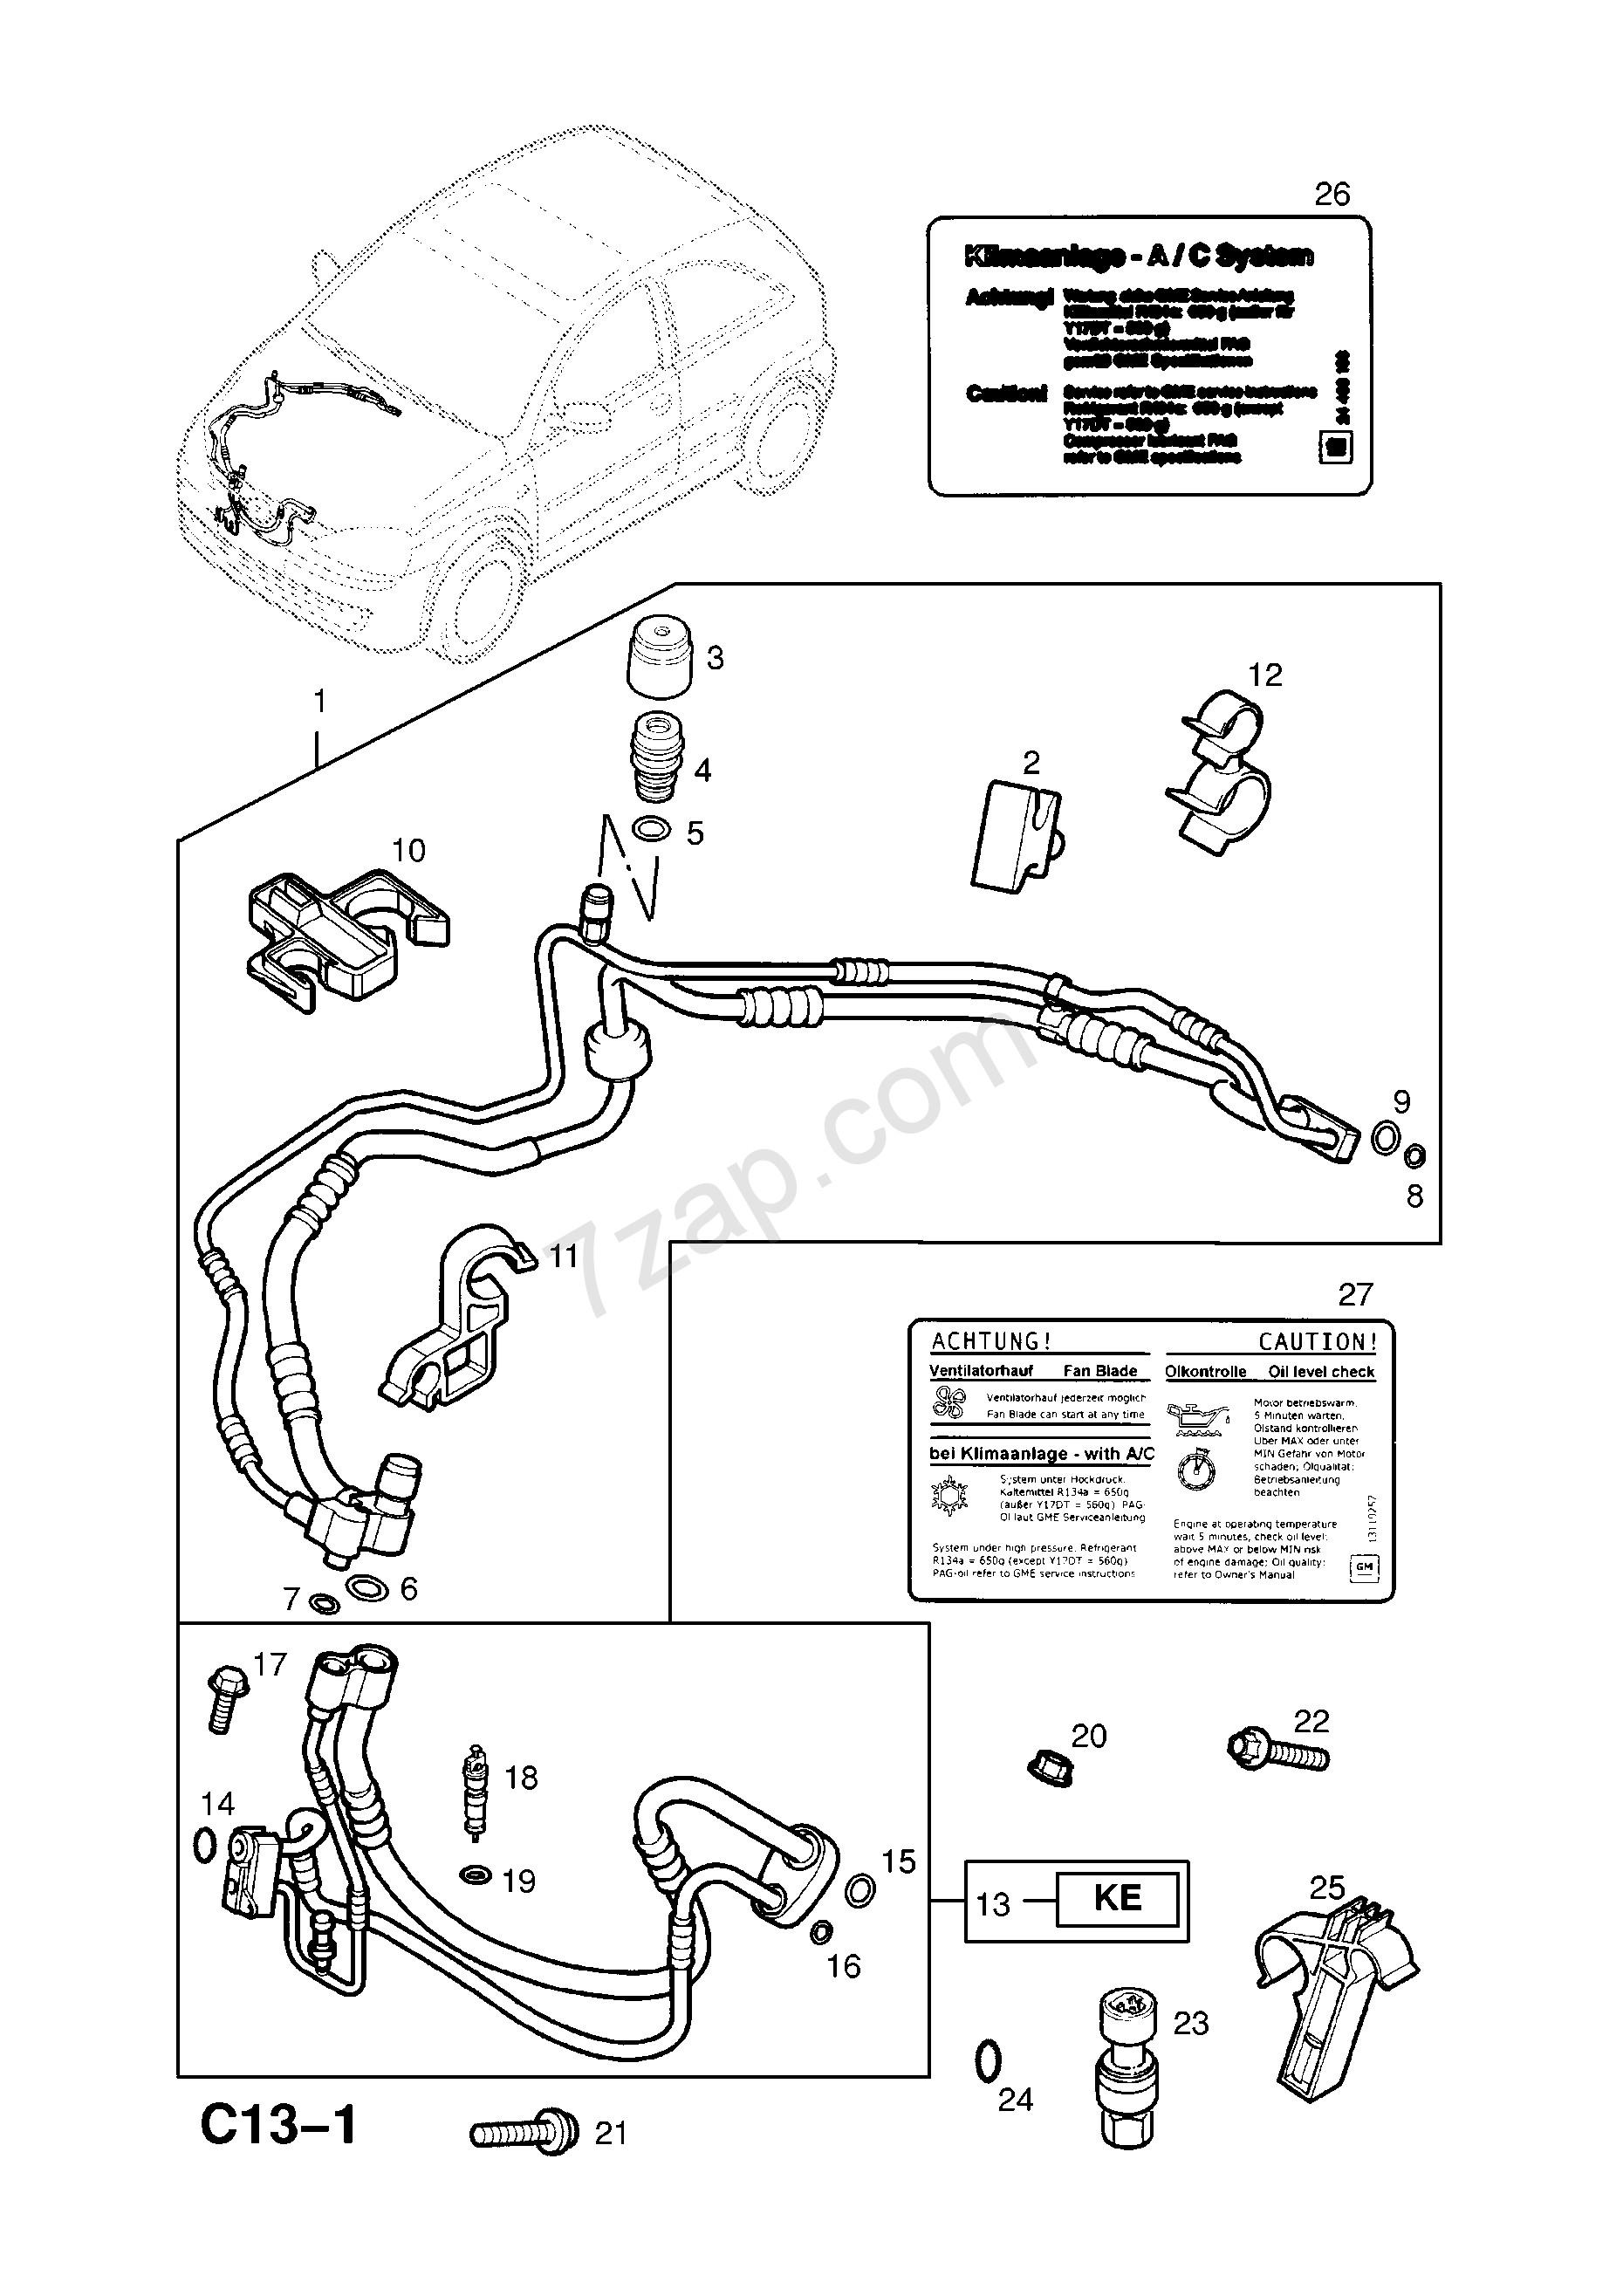 Vauxhall Corsa Engine Diagram 3 1 Liter Smart Wiring Related Post